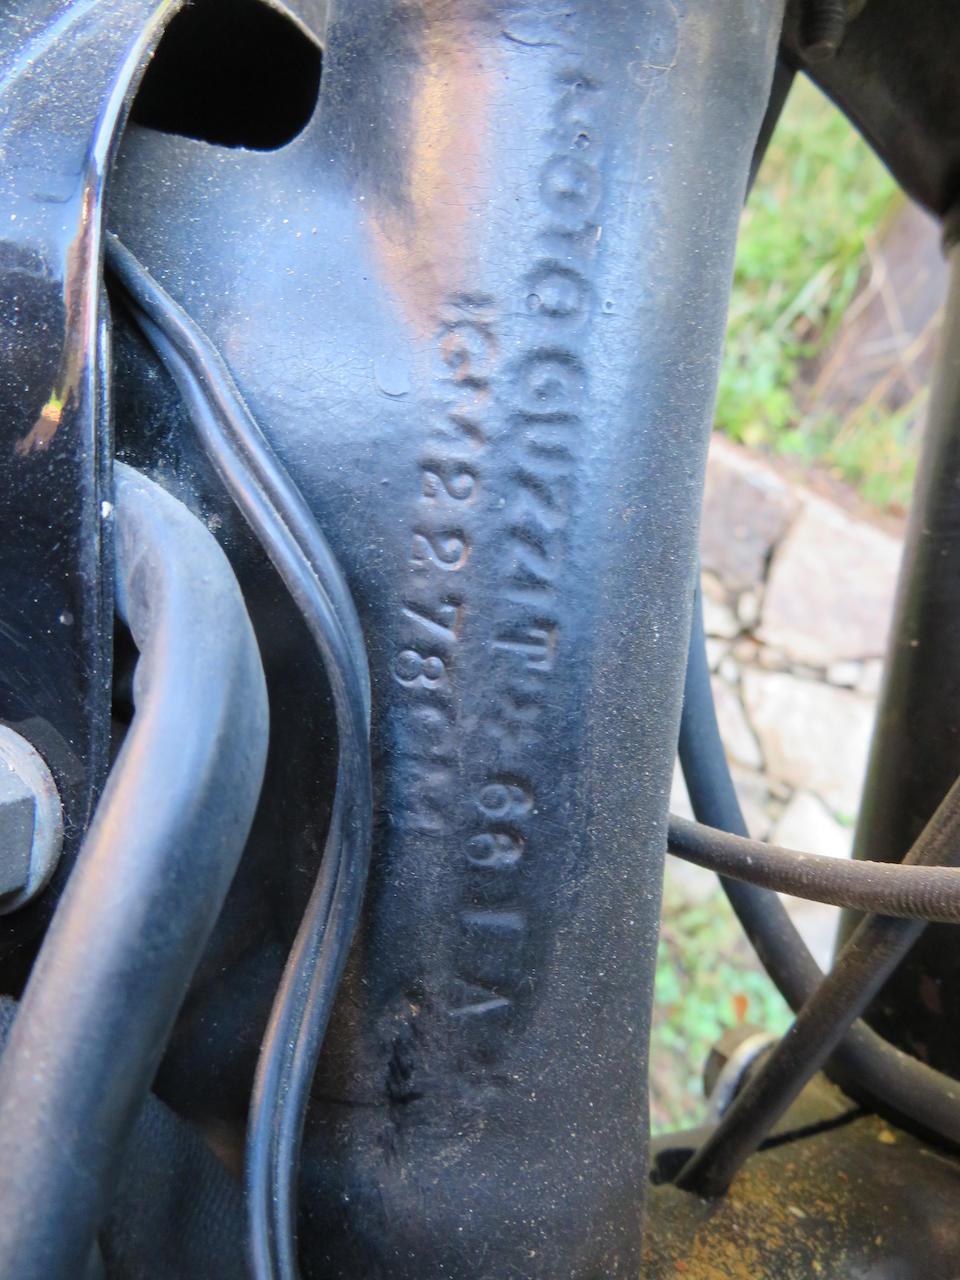 c.1962 Moto Guzzi 123cc Stornello Sport Frame no. T*66IA* Engine no. T*27IA*